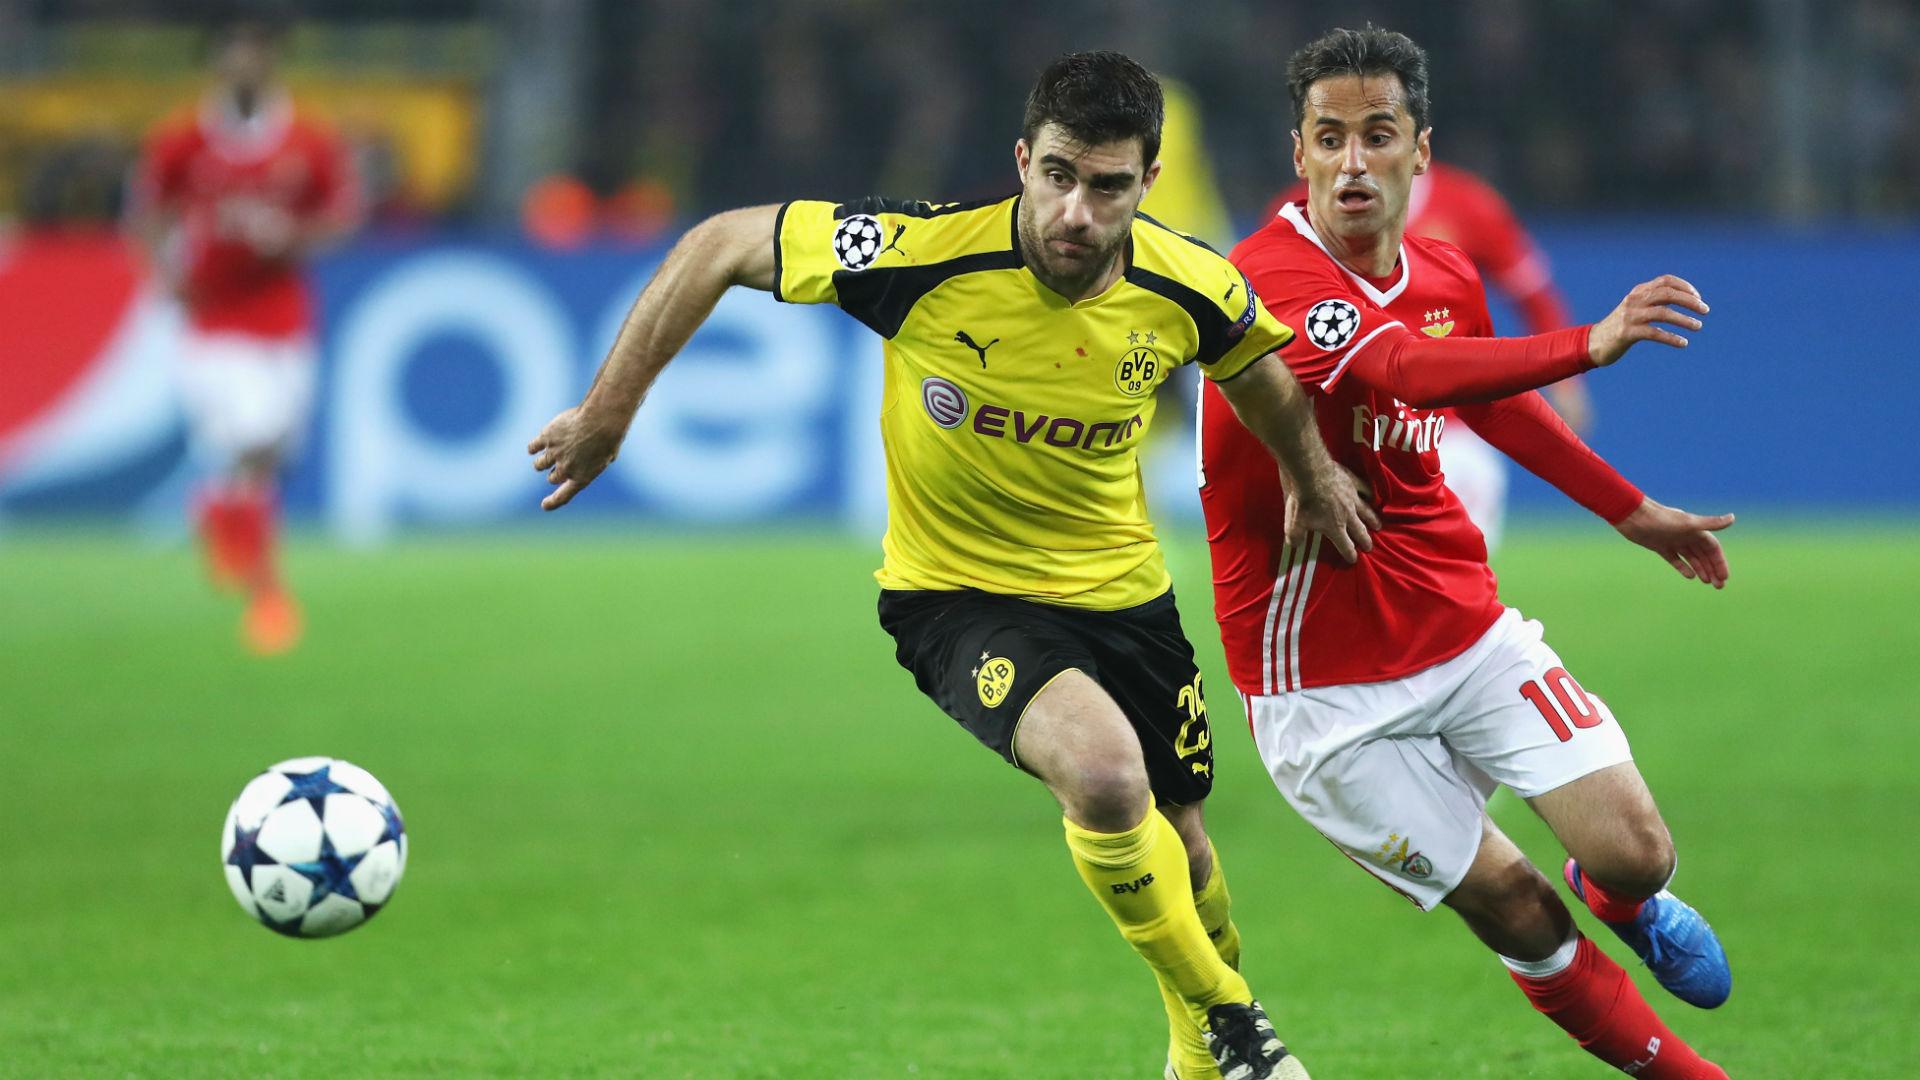 Sokratis Papastathopoulos Borussia Dortmund